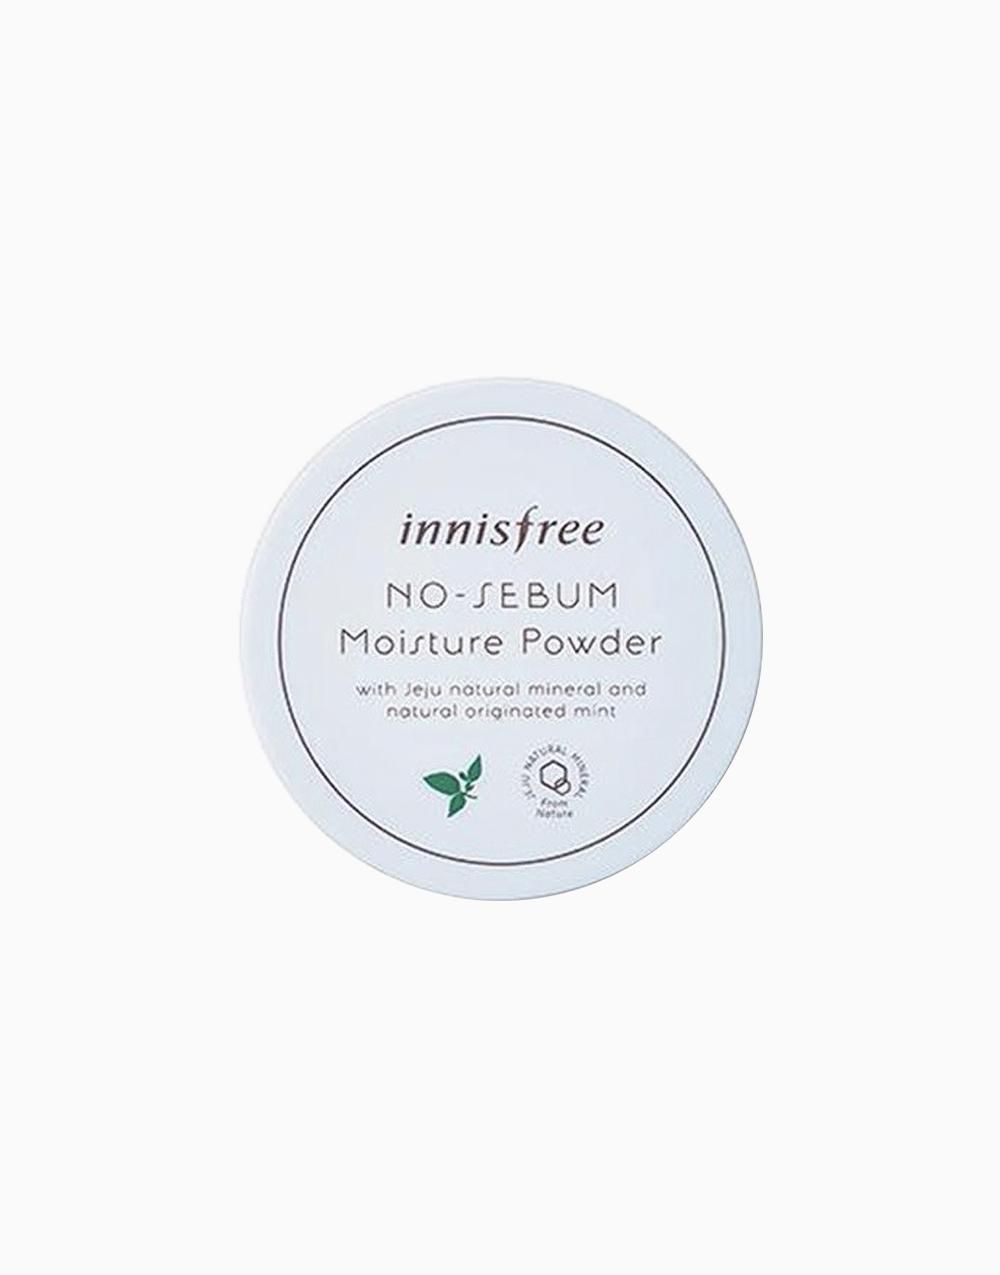 No-Sebum Moisture Powder by Innisfree